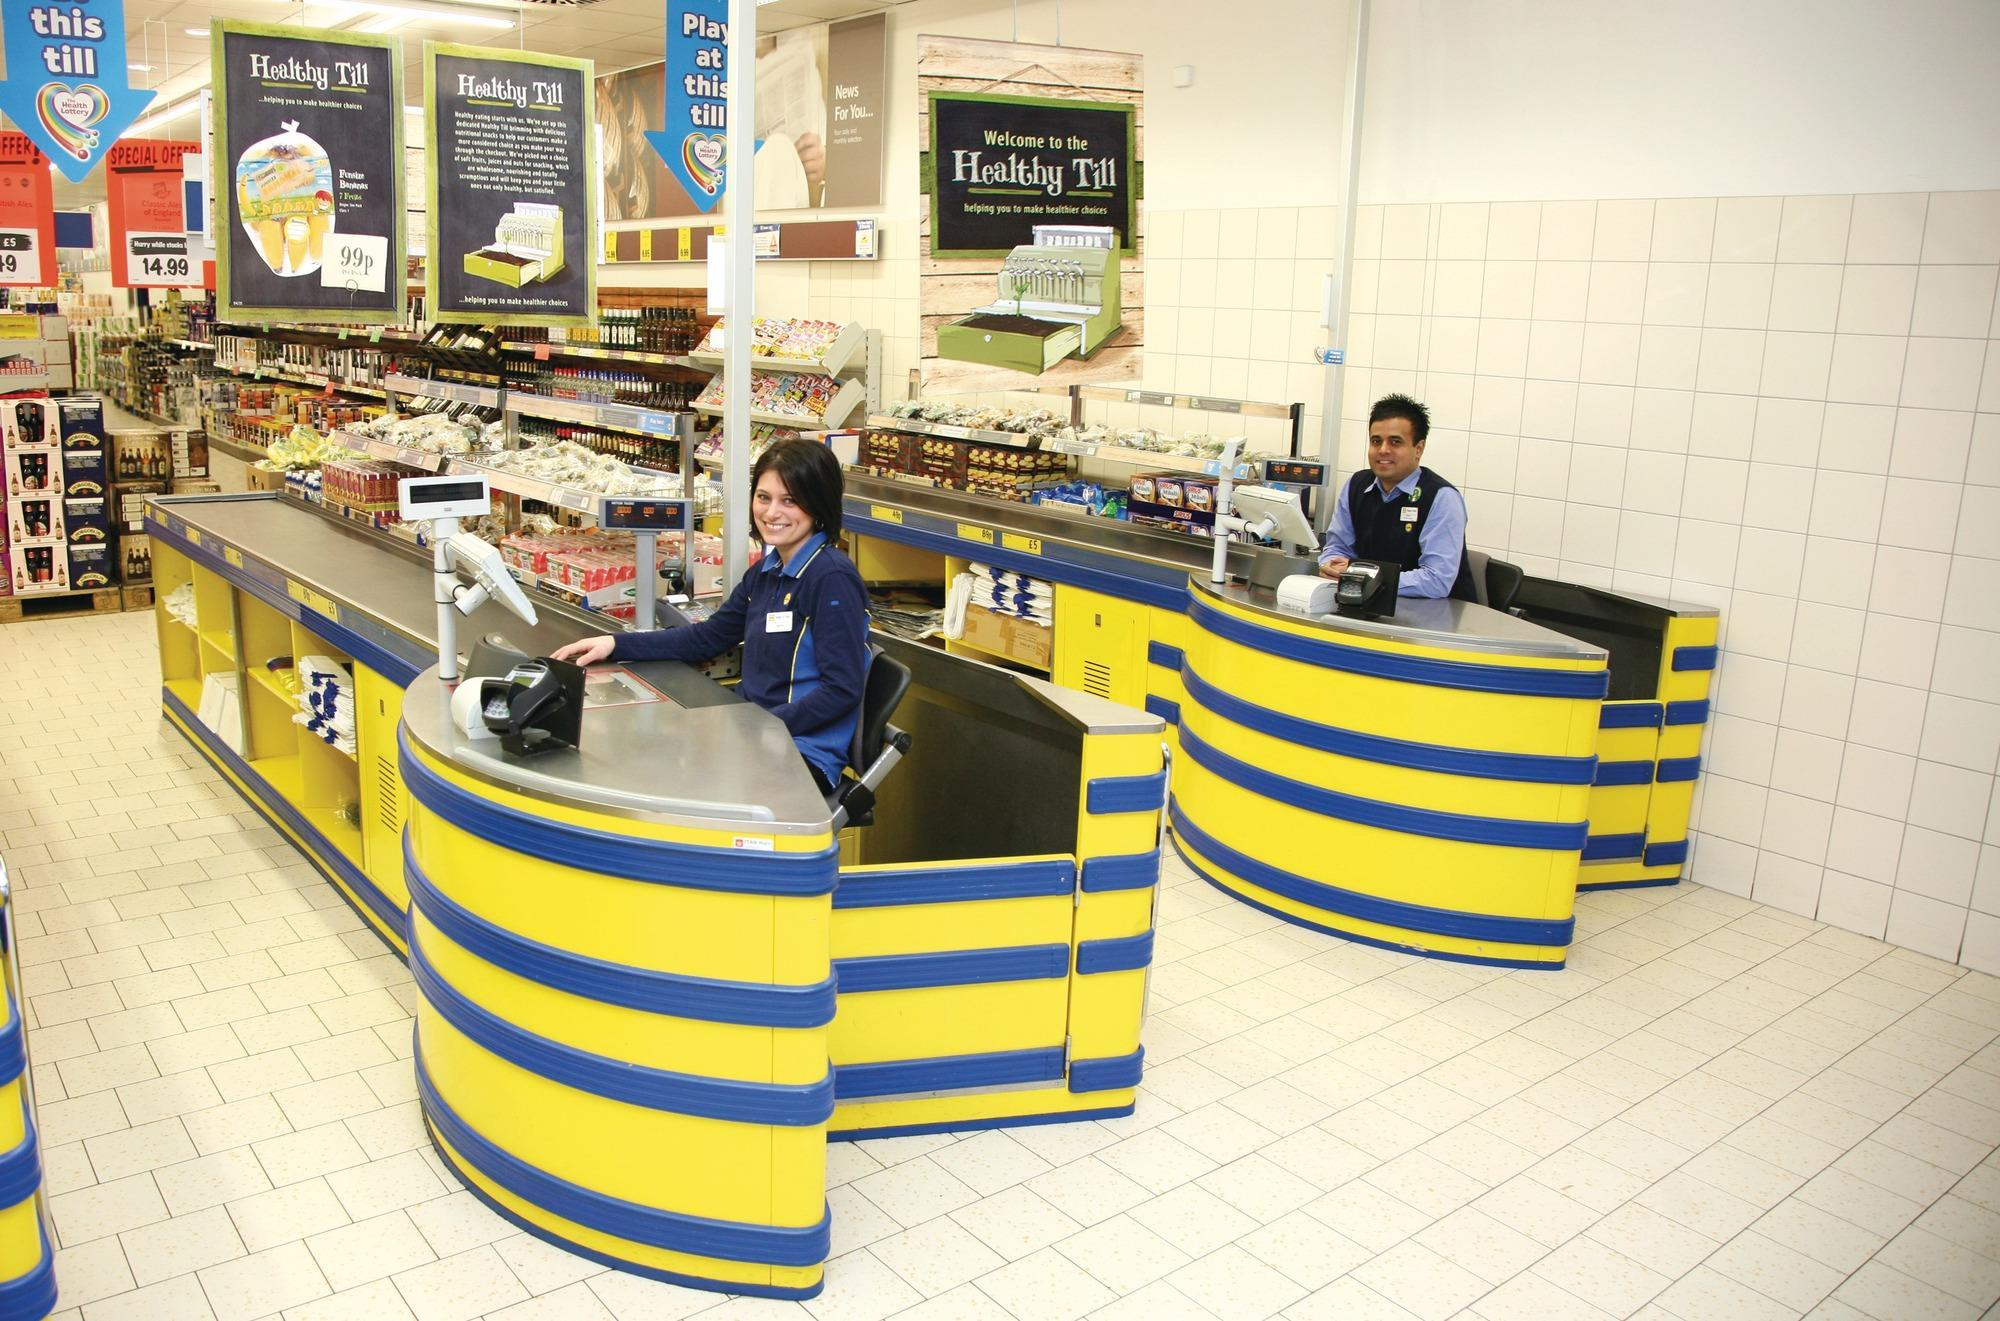 Sainsbury's employee uniform